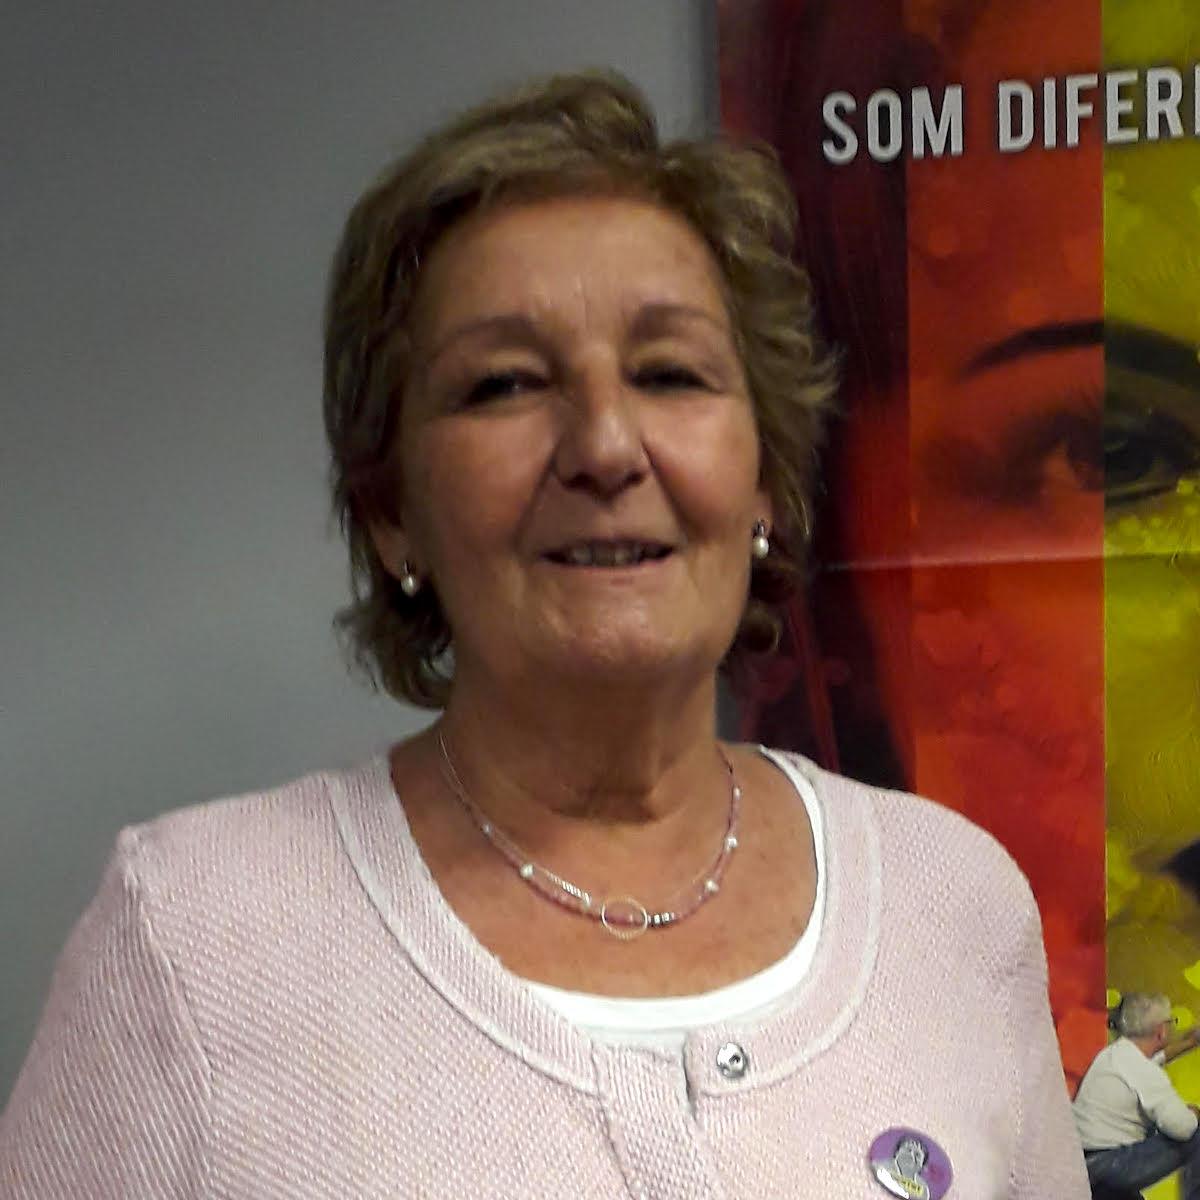 Maria Luisa jimenez Gusi LB Talks